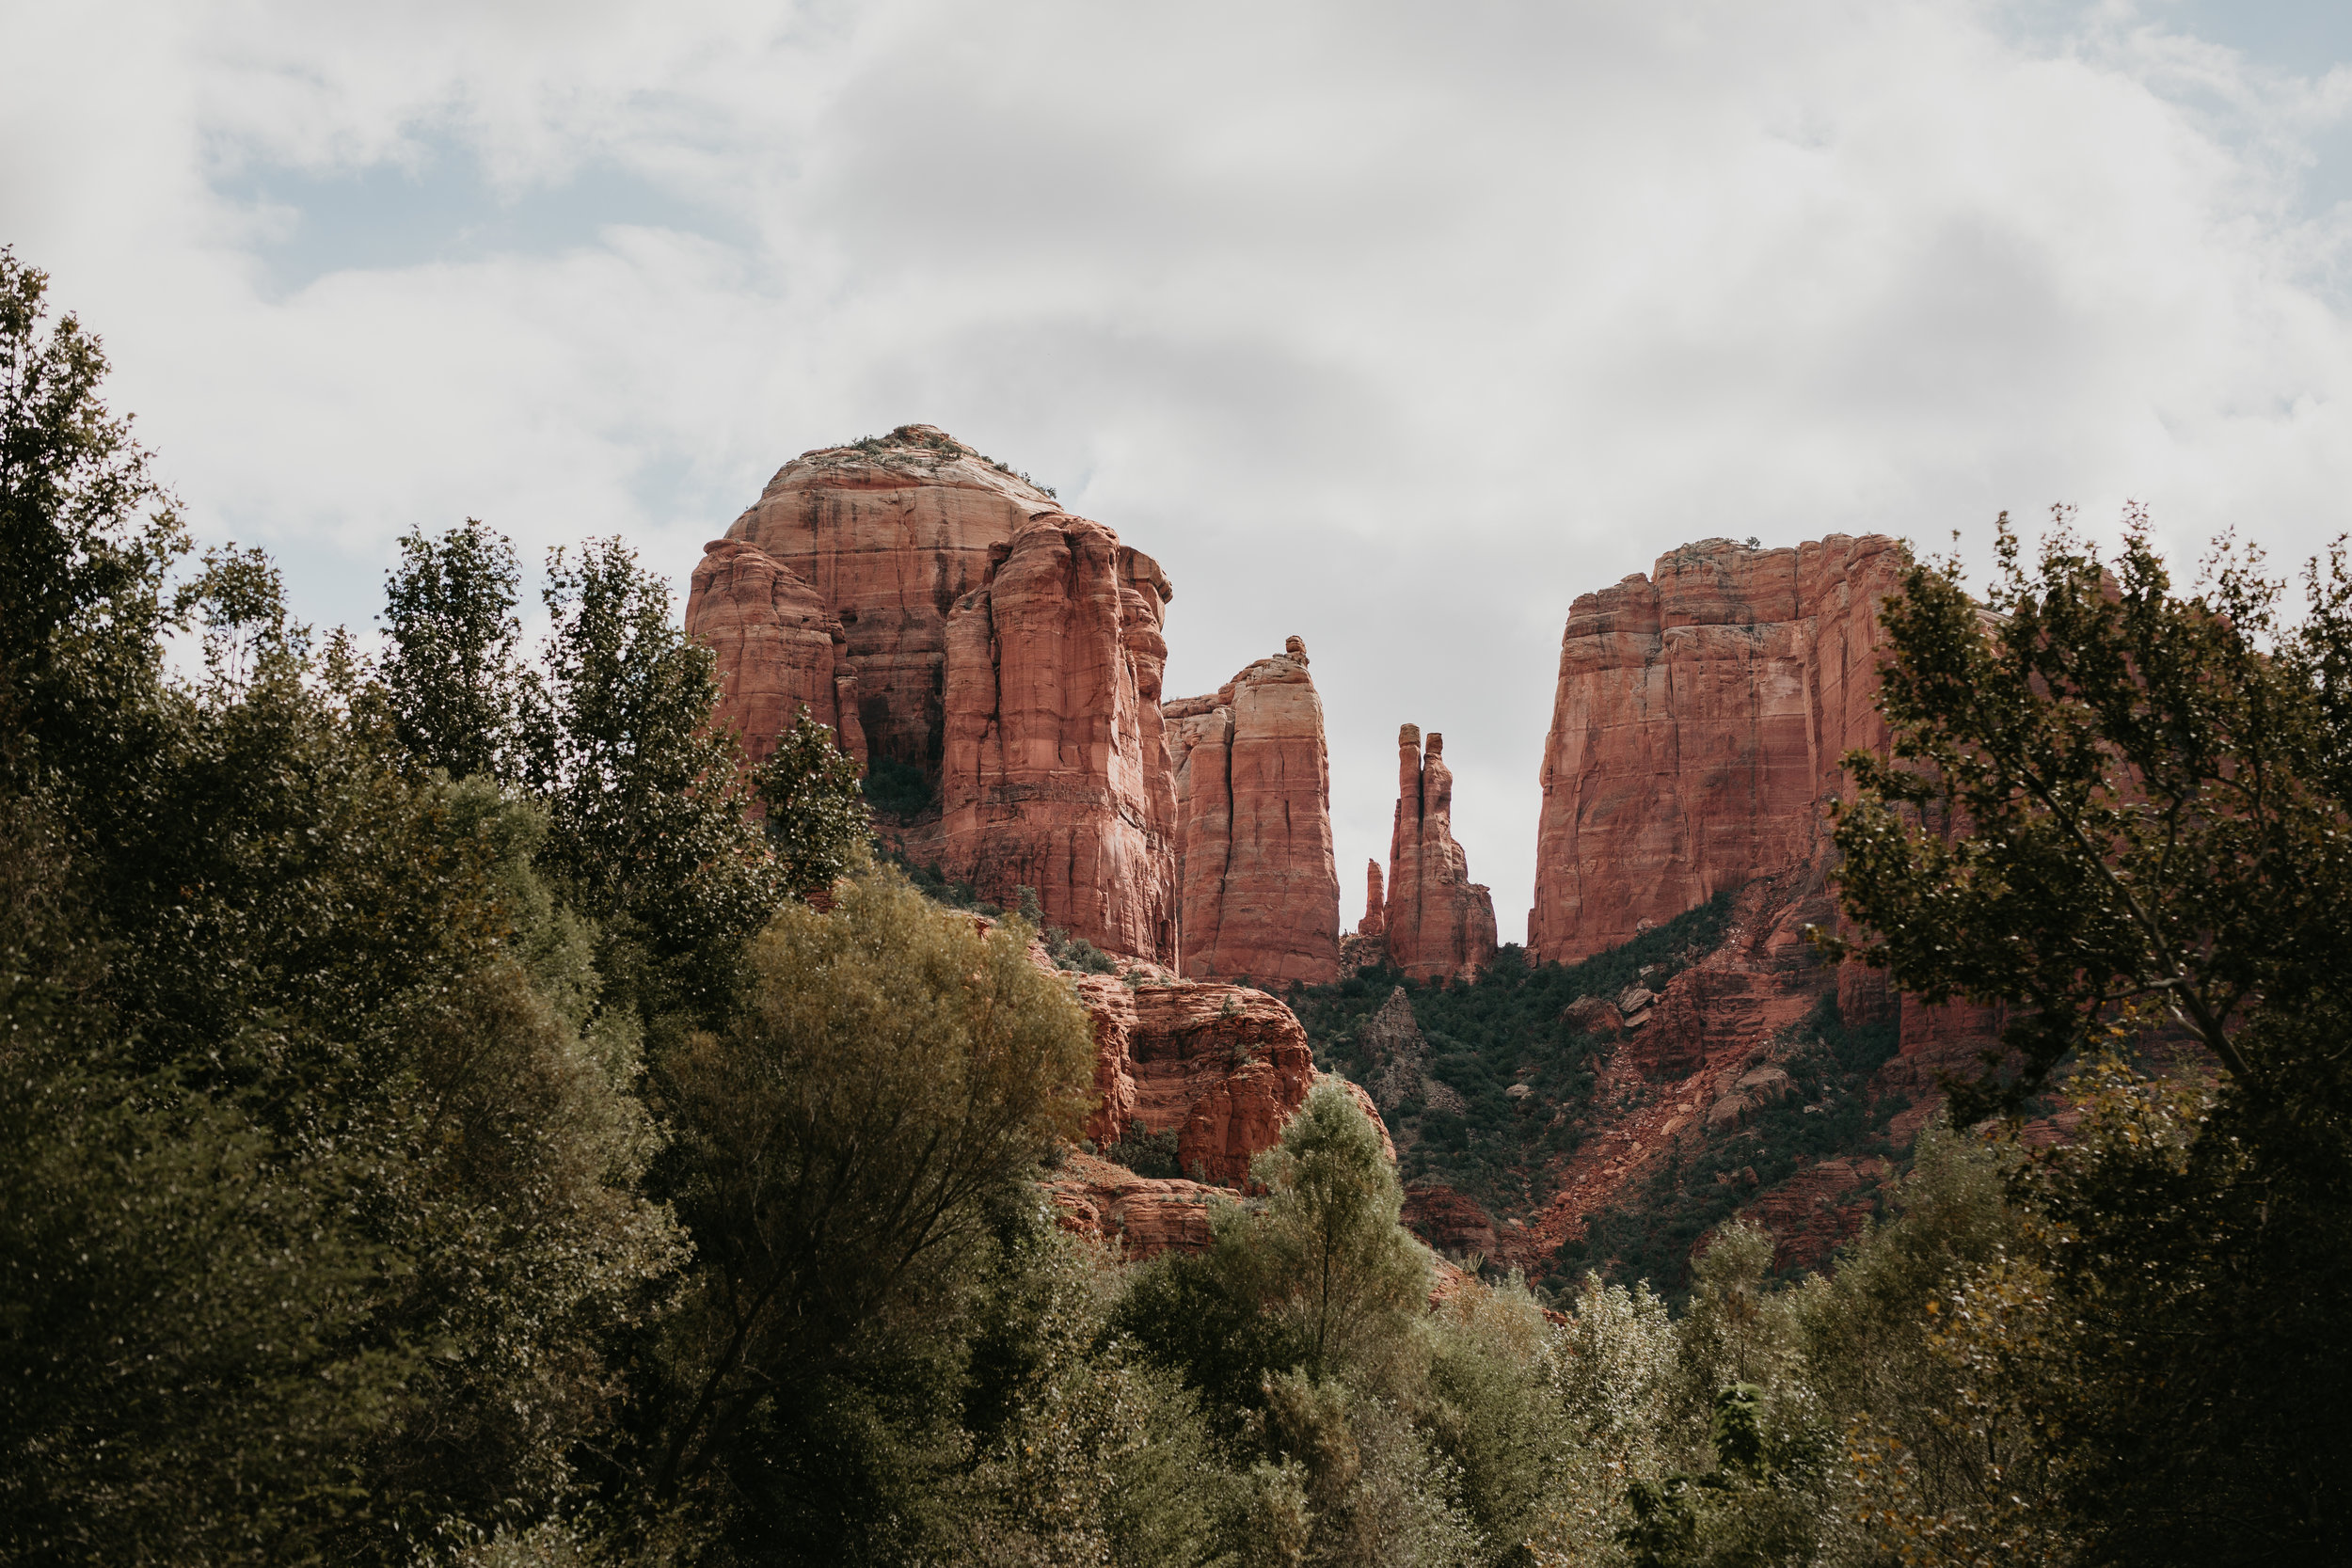 nicole-daacke-photography-sedona-arizona-destination-elopement-wedding-photographer-catherdral-rock-hiking-elopement-sedona-river-elopement-photos-desert-rock-wedding-photographer-laid-back-spontaneous-elopement-103.jpg